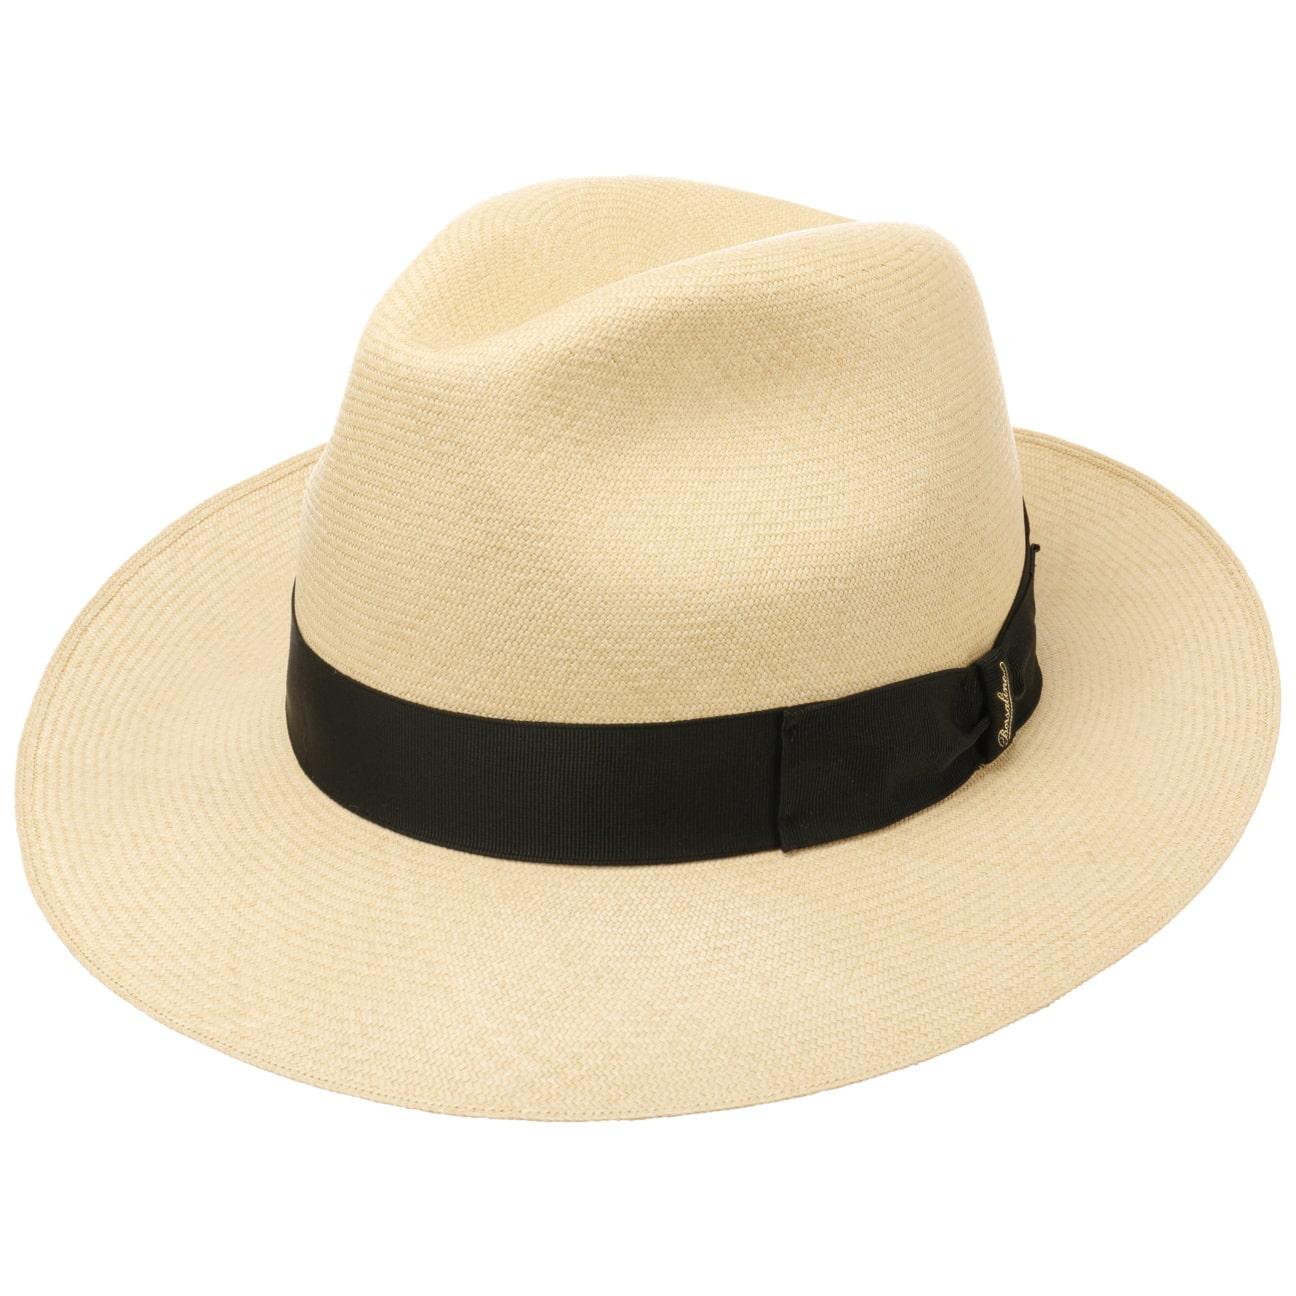 ... Cappello Panama Bogart Premium by Borsalino - natura 5 9bd89607dbb0